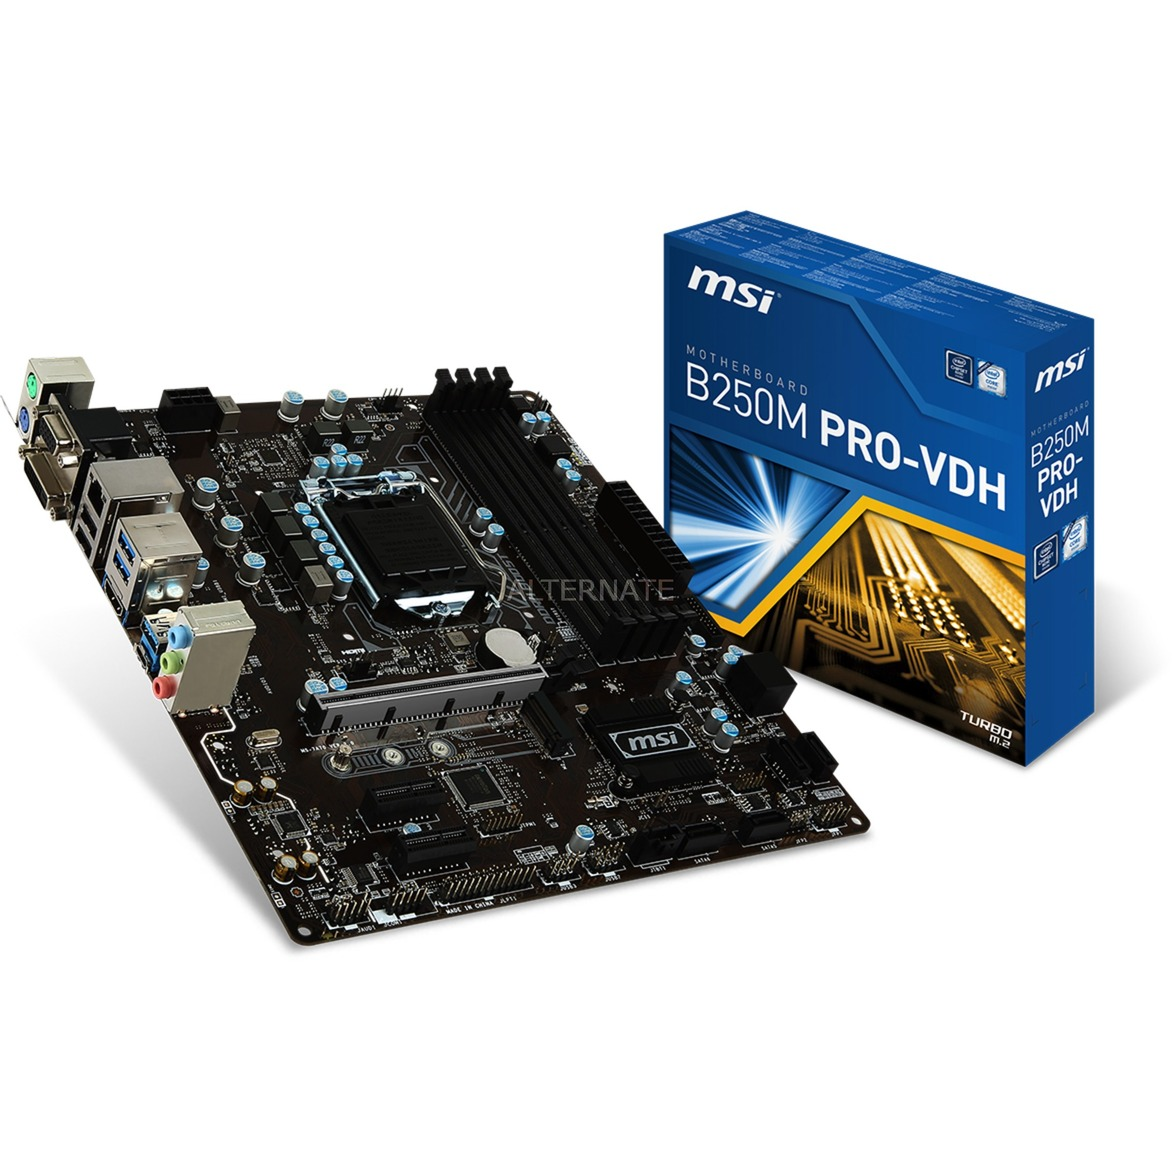 b250m-pro-vdh-intel-b250-lga-1151-socket-h4-micro-atx-bundkort